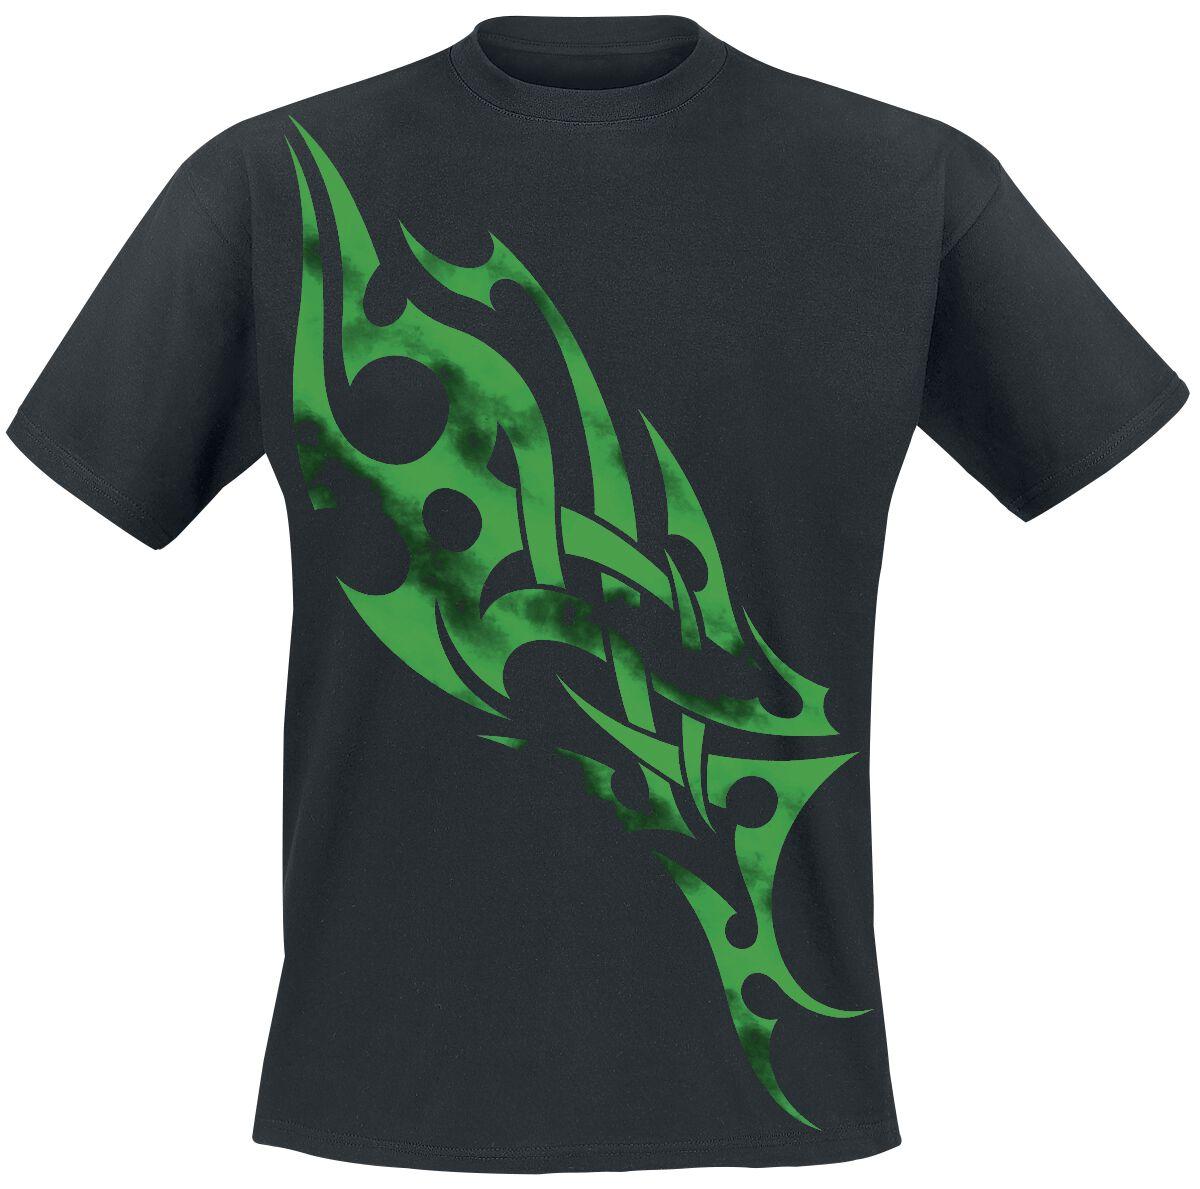 Motyw - Koszulki - T-Shirt Green Smoky Tribal T-Shirt czarny - 202120